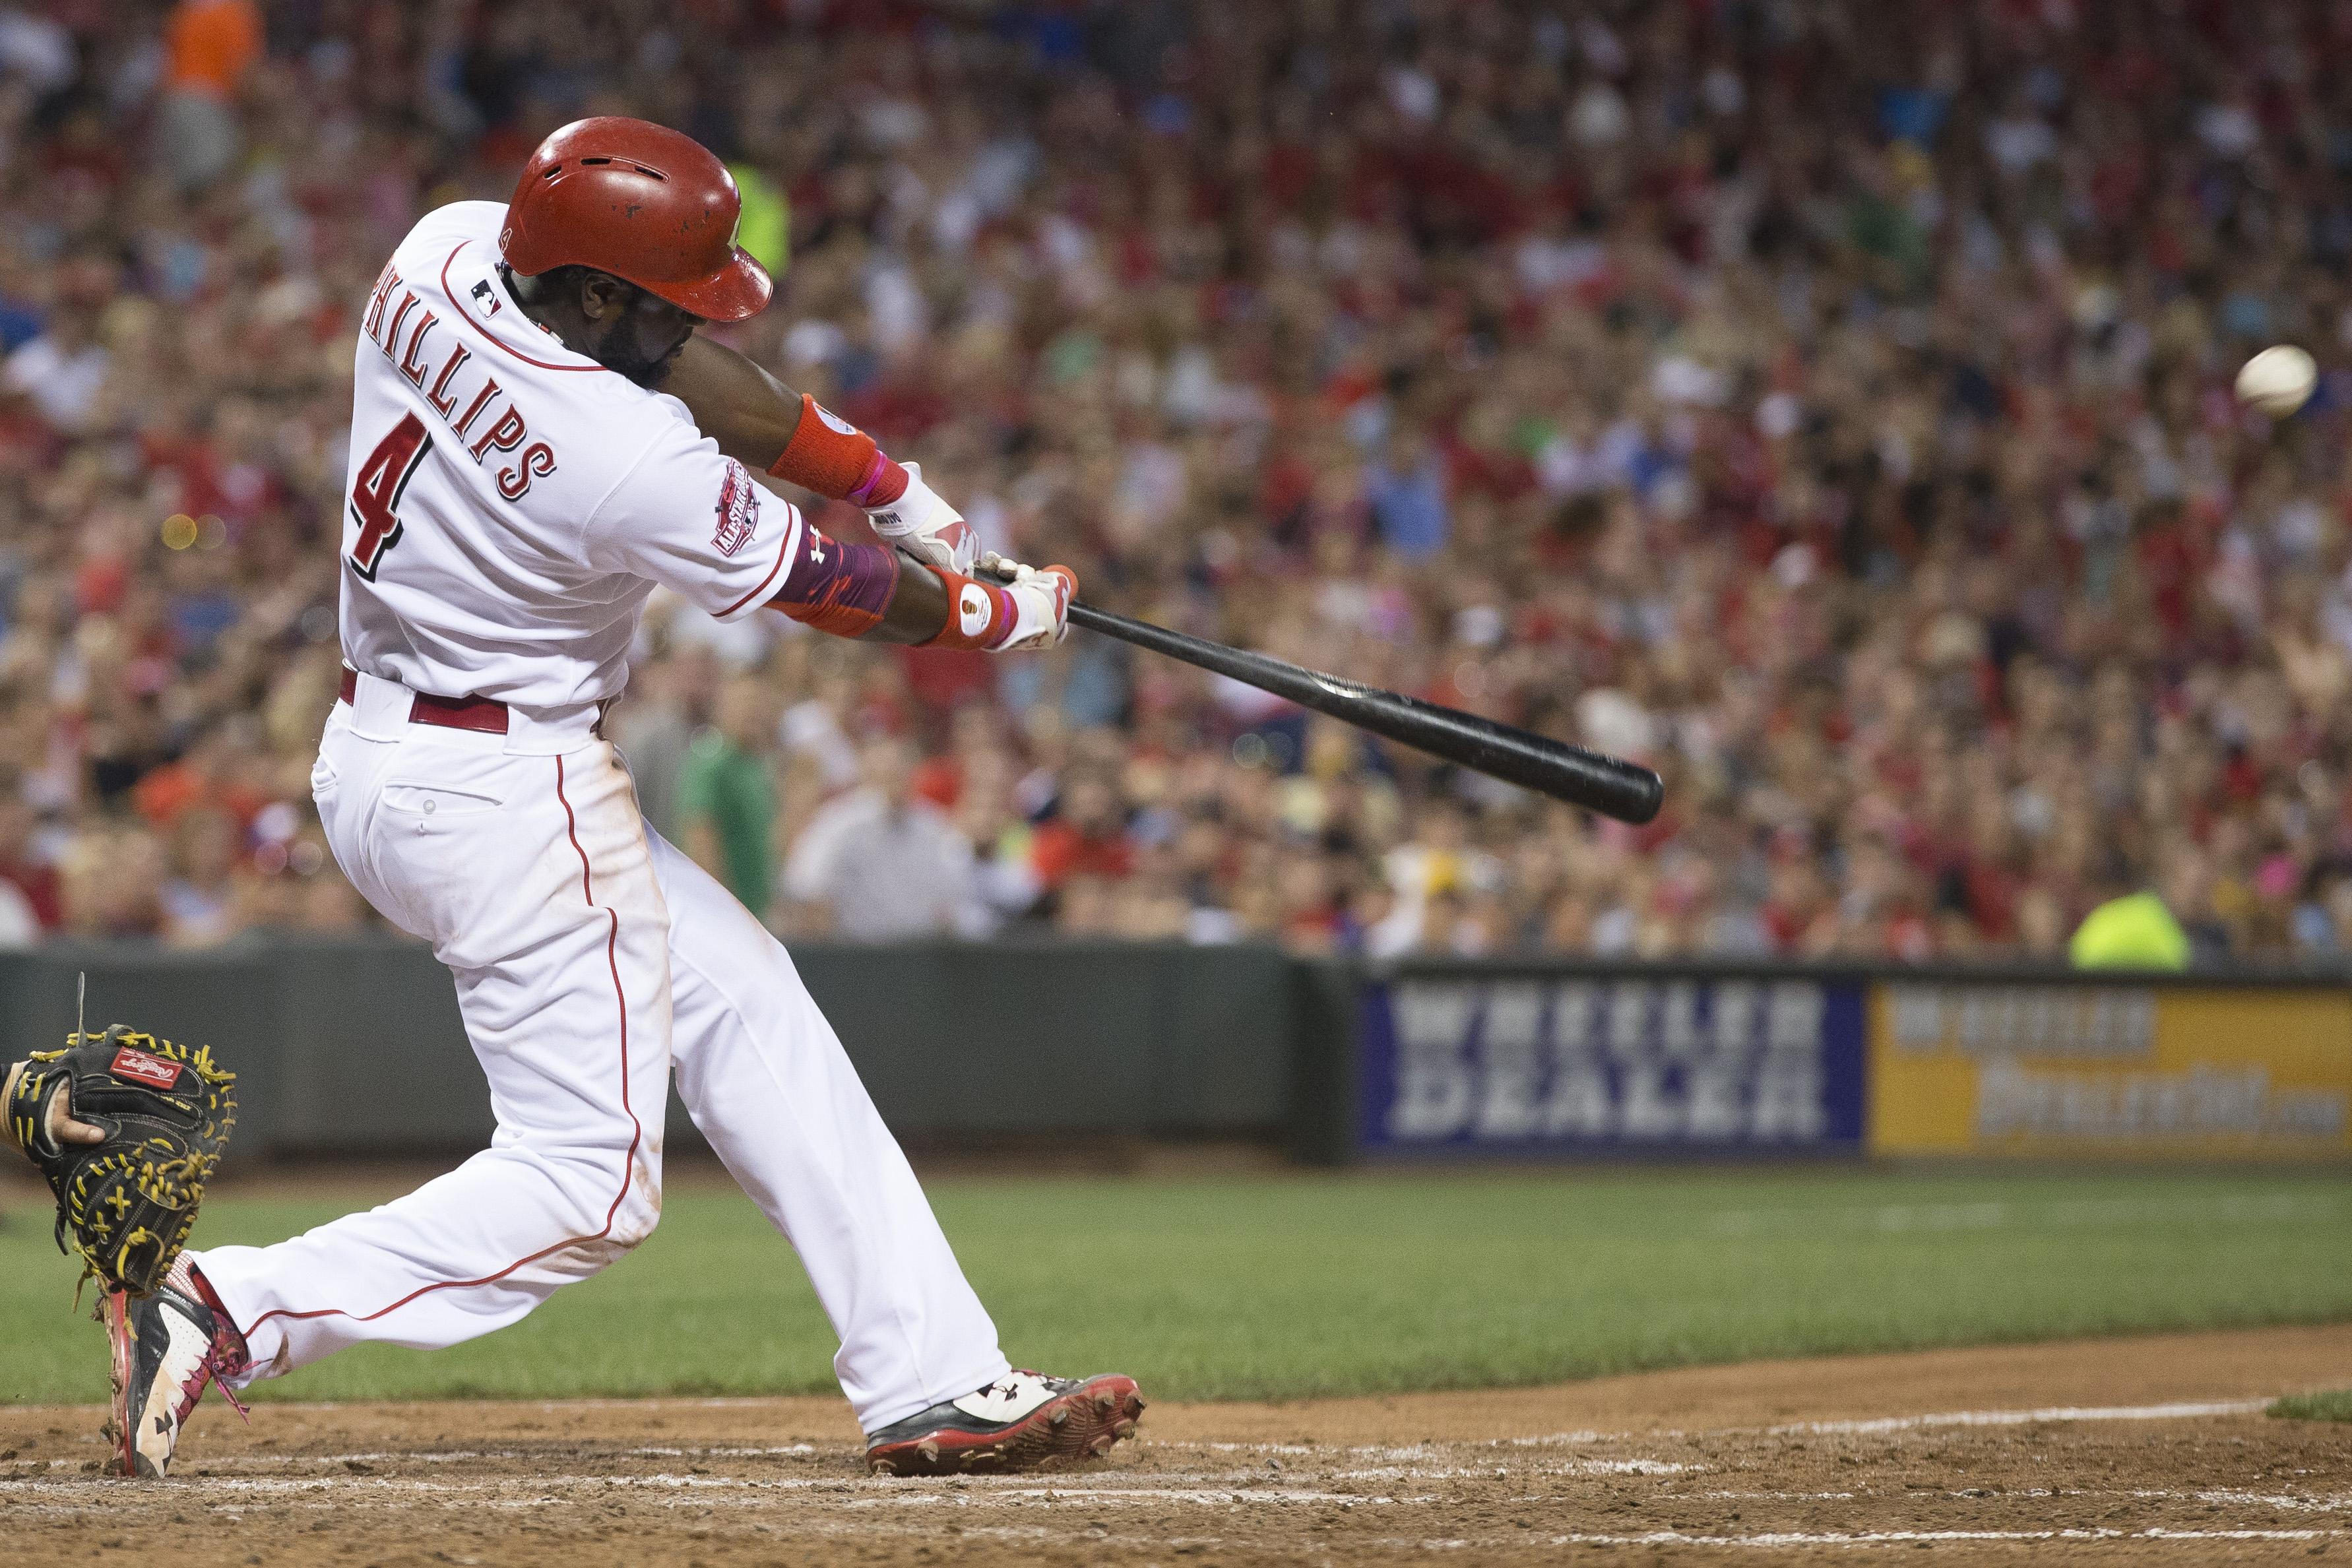 Cincinnati Reds' Brandon Phillips hits a three-run home run off Pittsburgh Pirates relief pitcher Deolis Guerra in the fifth inning of a baseball game, Thursday, July 30, 2015, in Cincinnati. (AP Photo/John Minchillo)